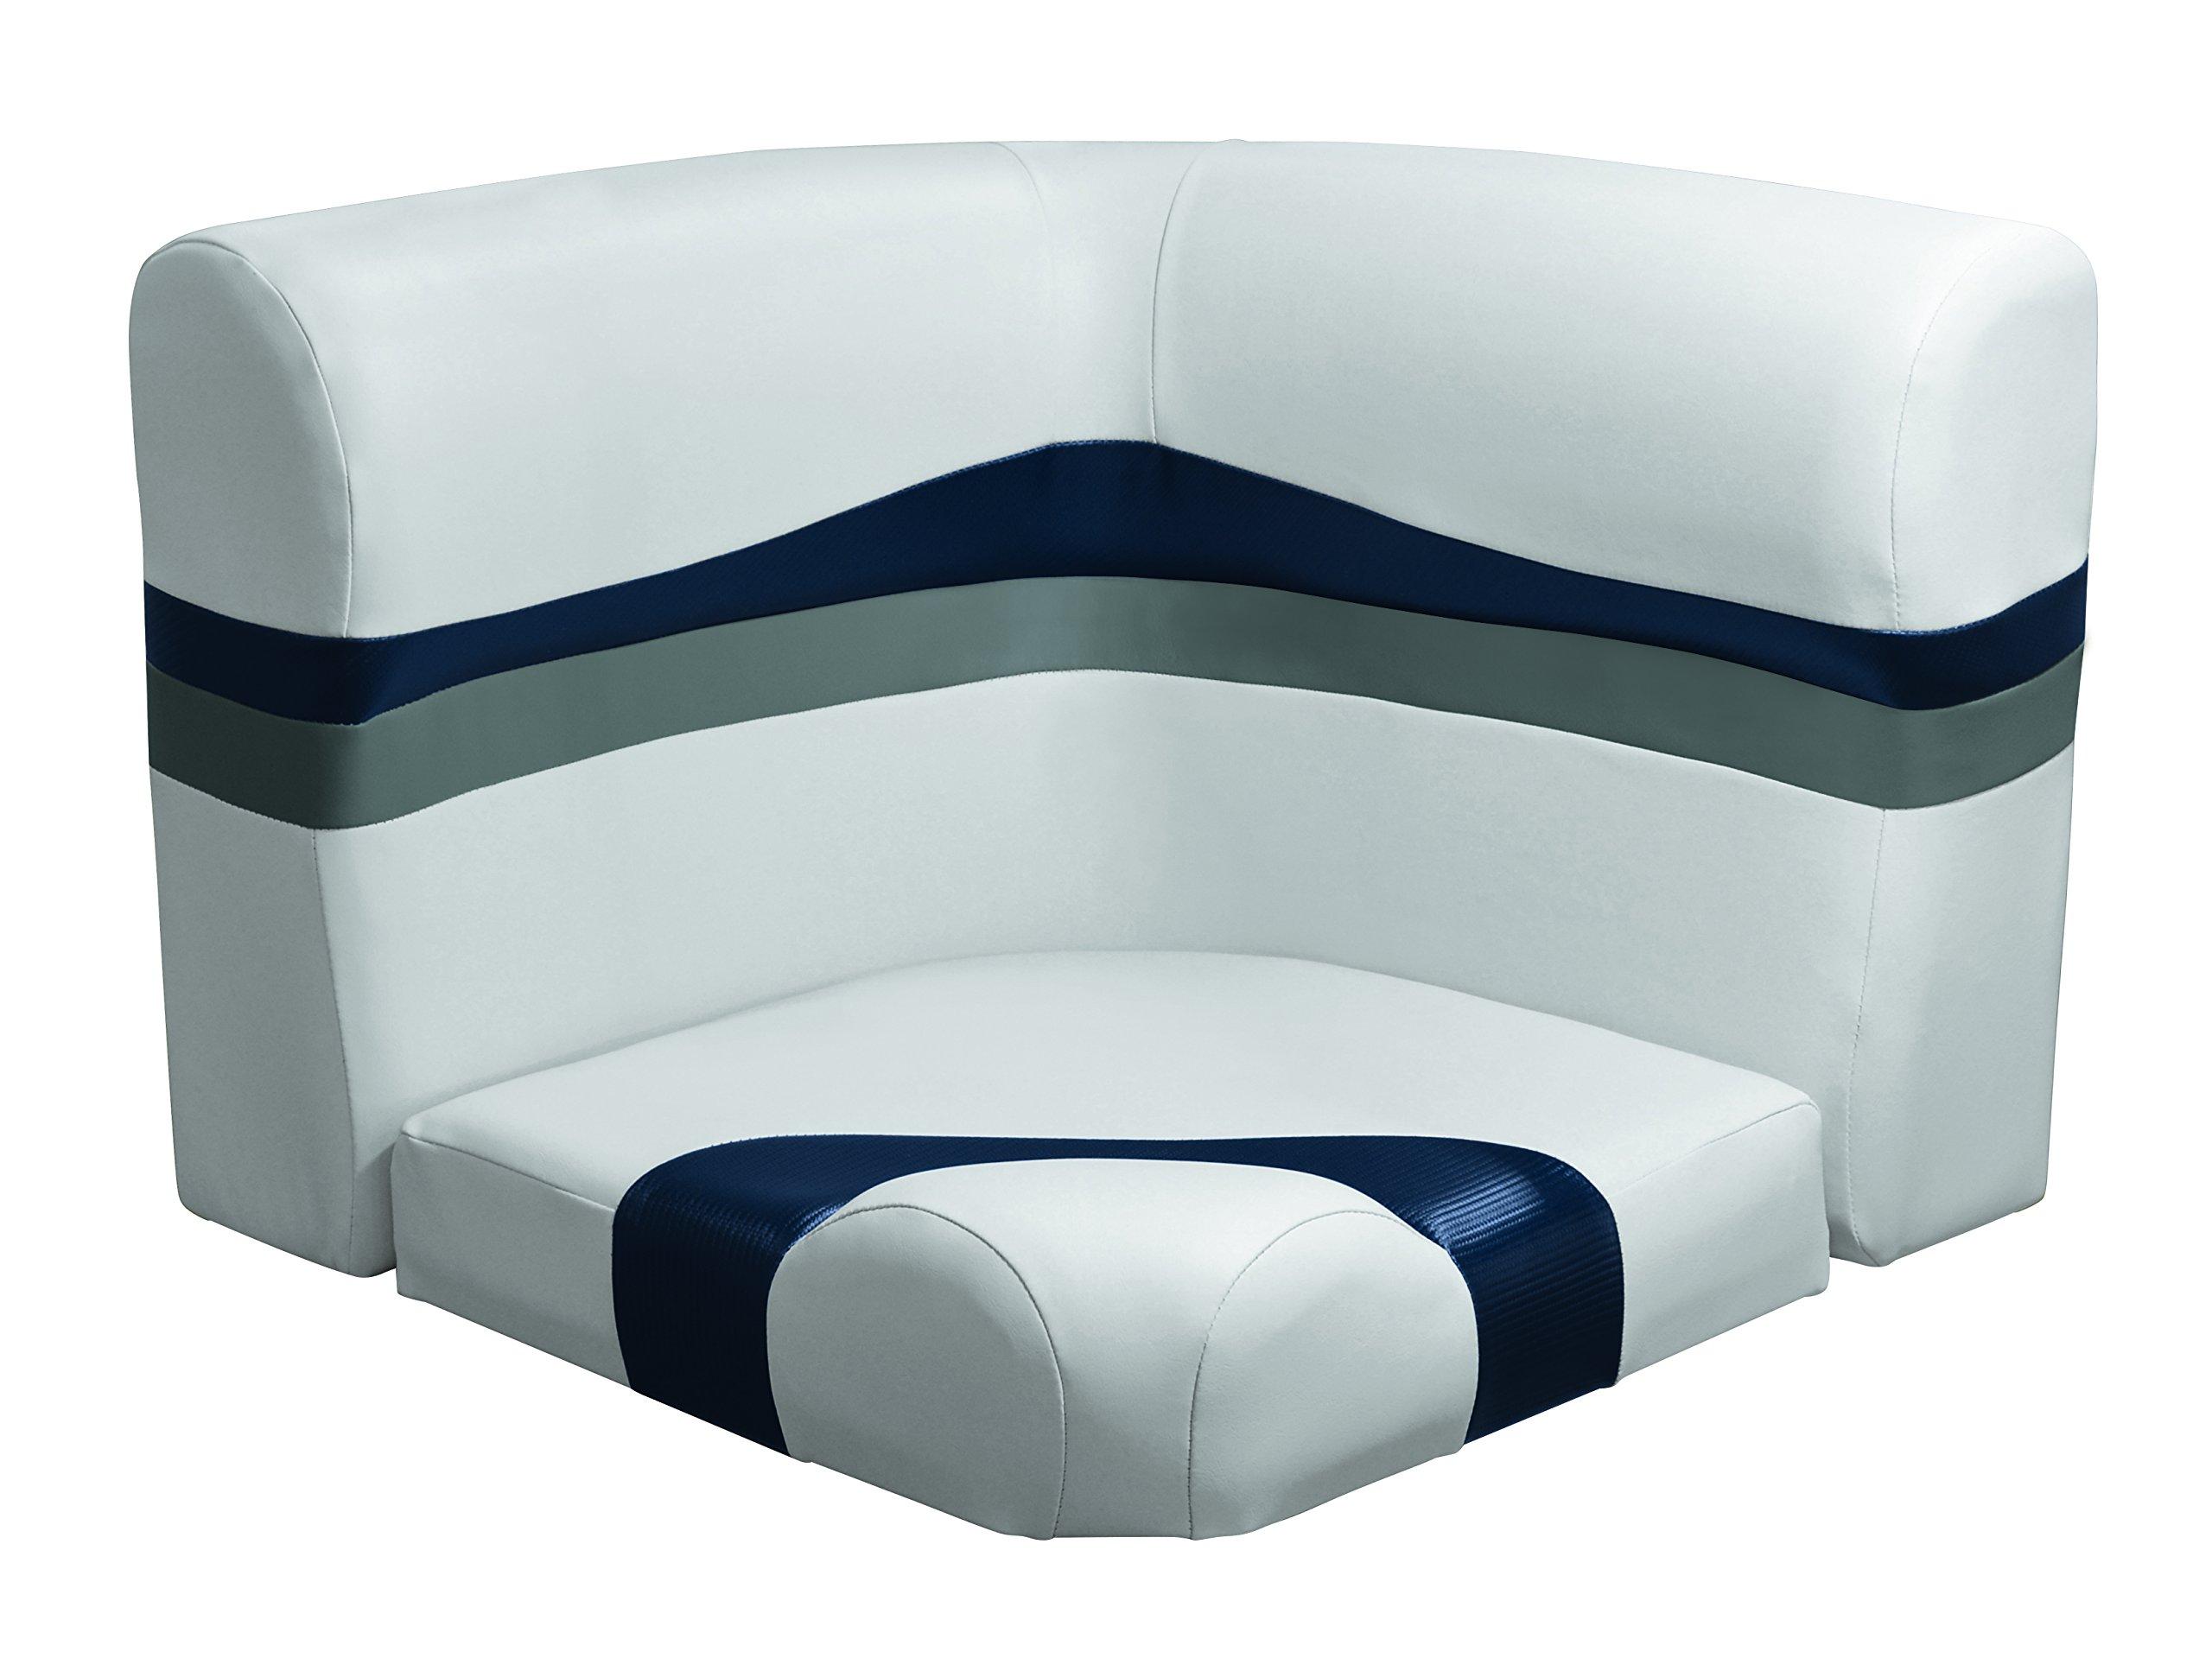 Wise 3004-2-1801 Talon 25'' Radius Corner Back & Bottom Cushion Set Only, Sky Grey-Dove Grey-Laguna Blue Carbon Fiber by Wise